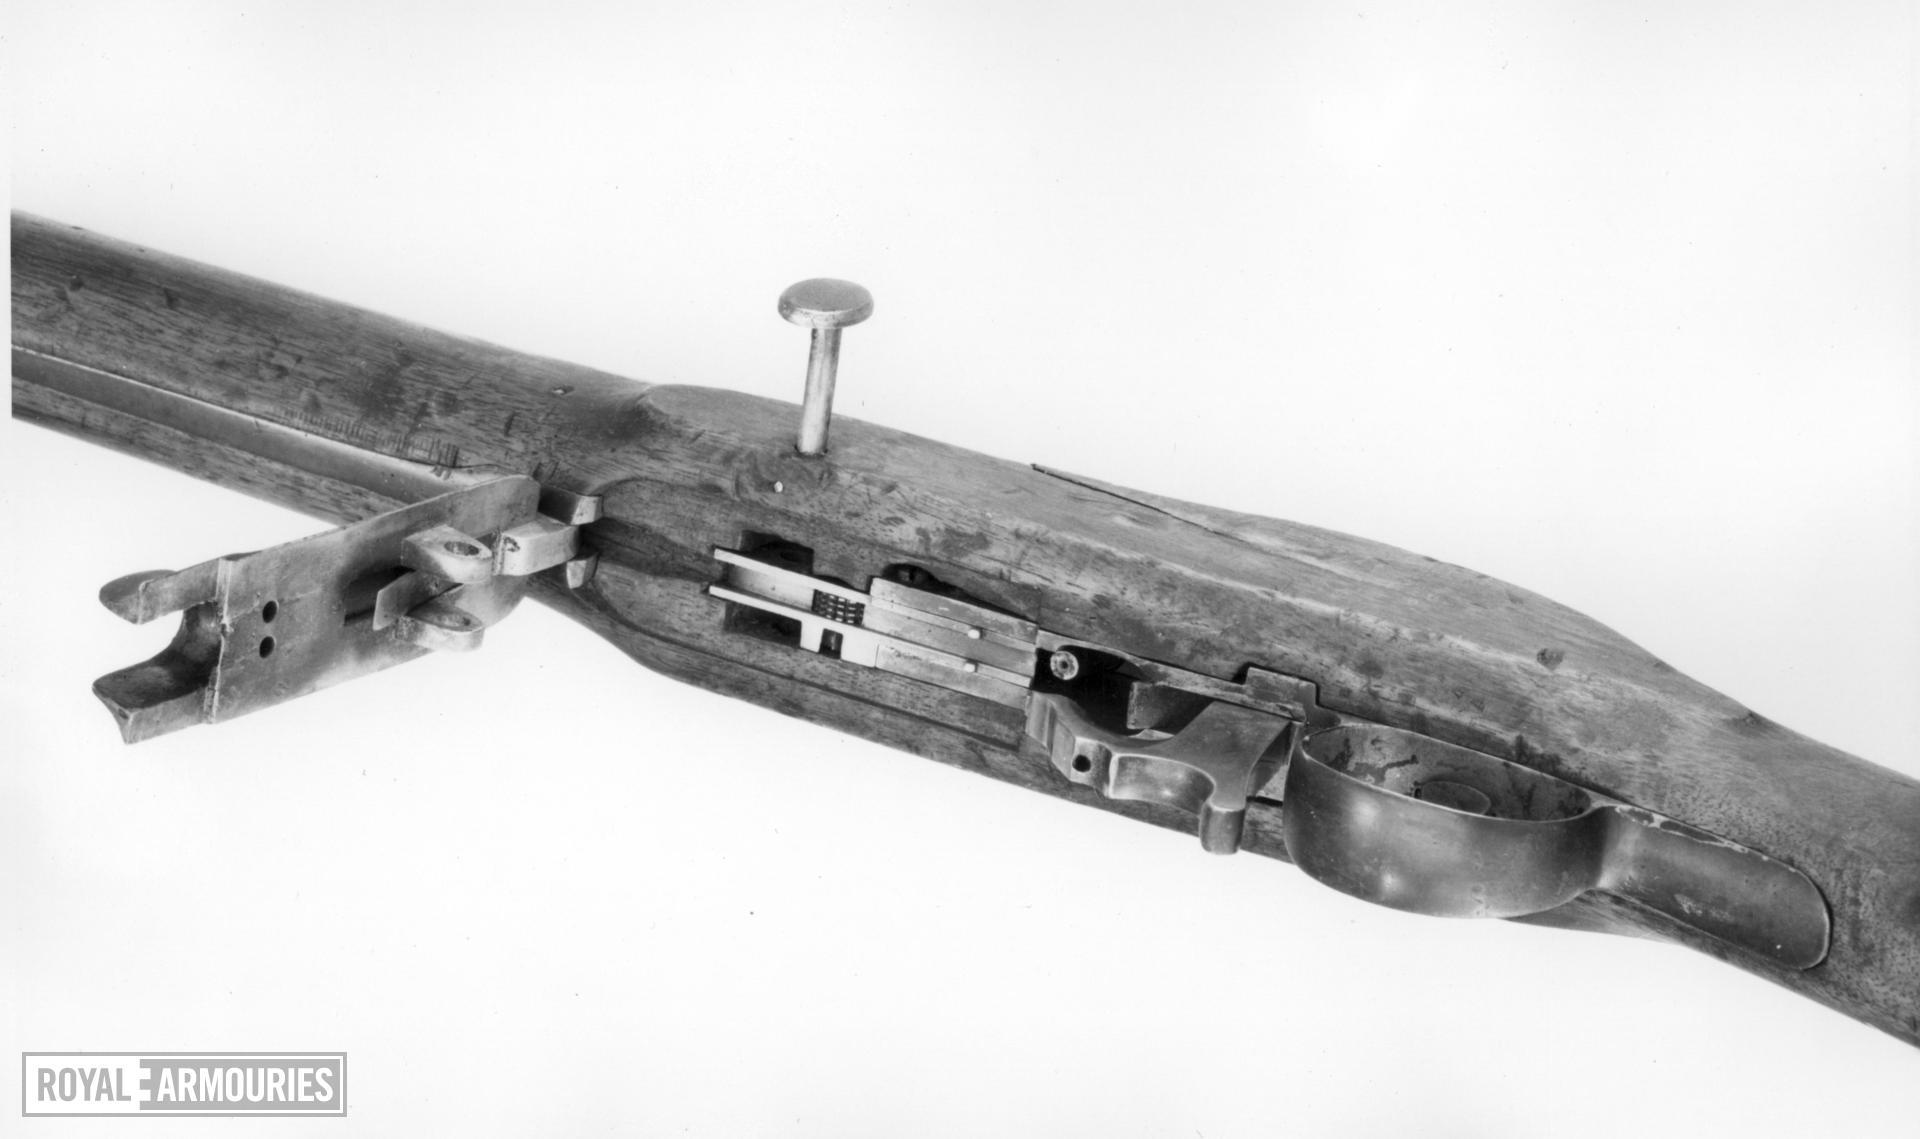 Percussion muzzle-loading musket - Heurteloup Musket